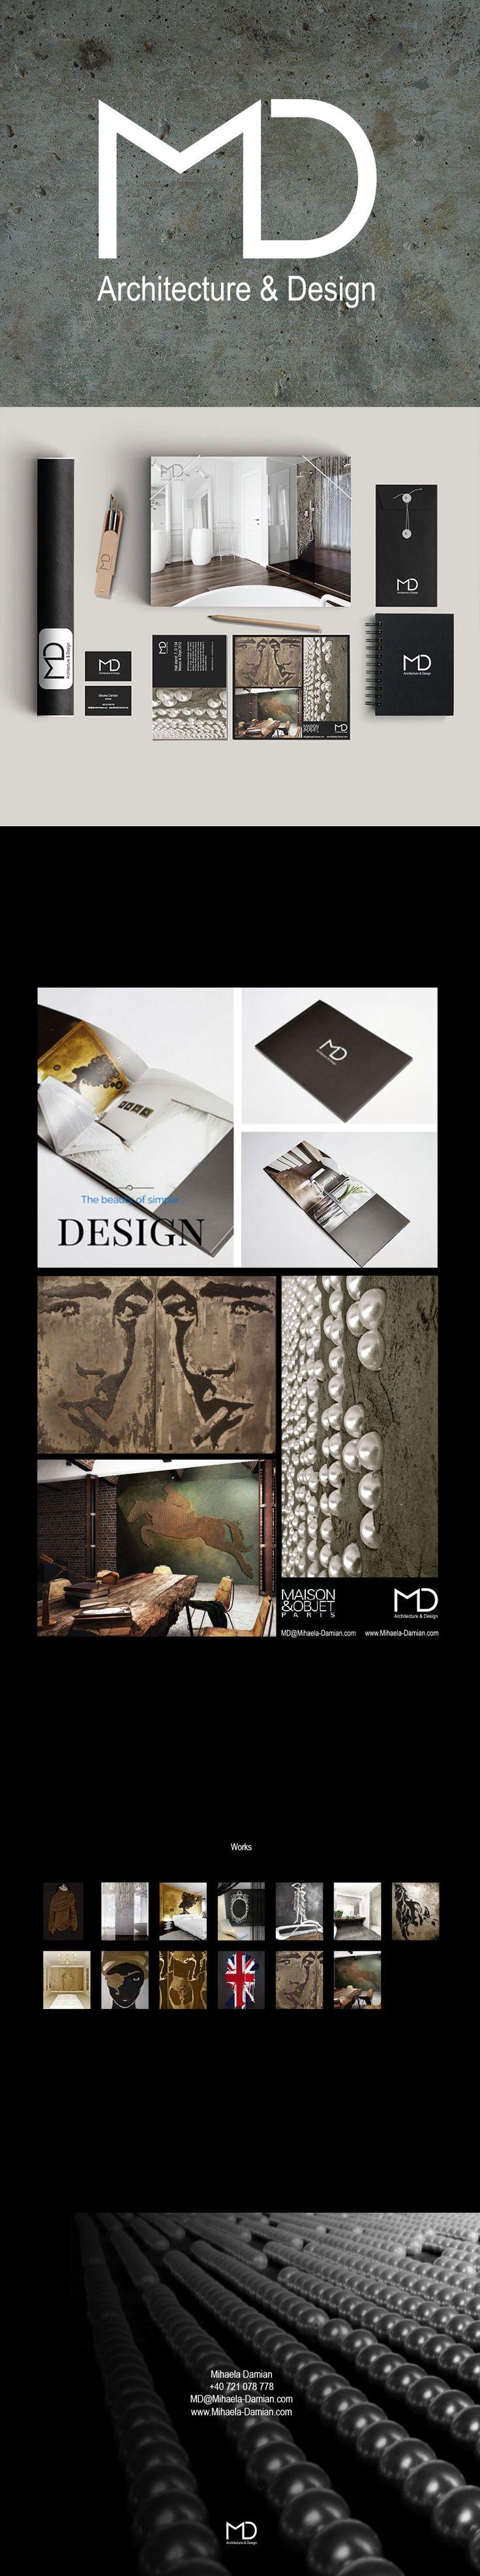 MD Architecture & Design — UnfoldAtelier: Boost Sales with Friendly Design